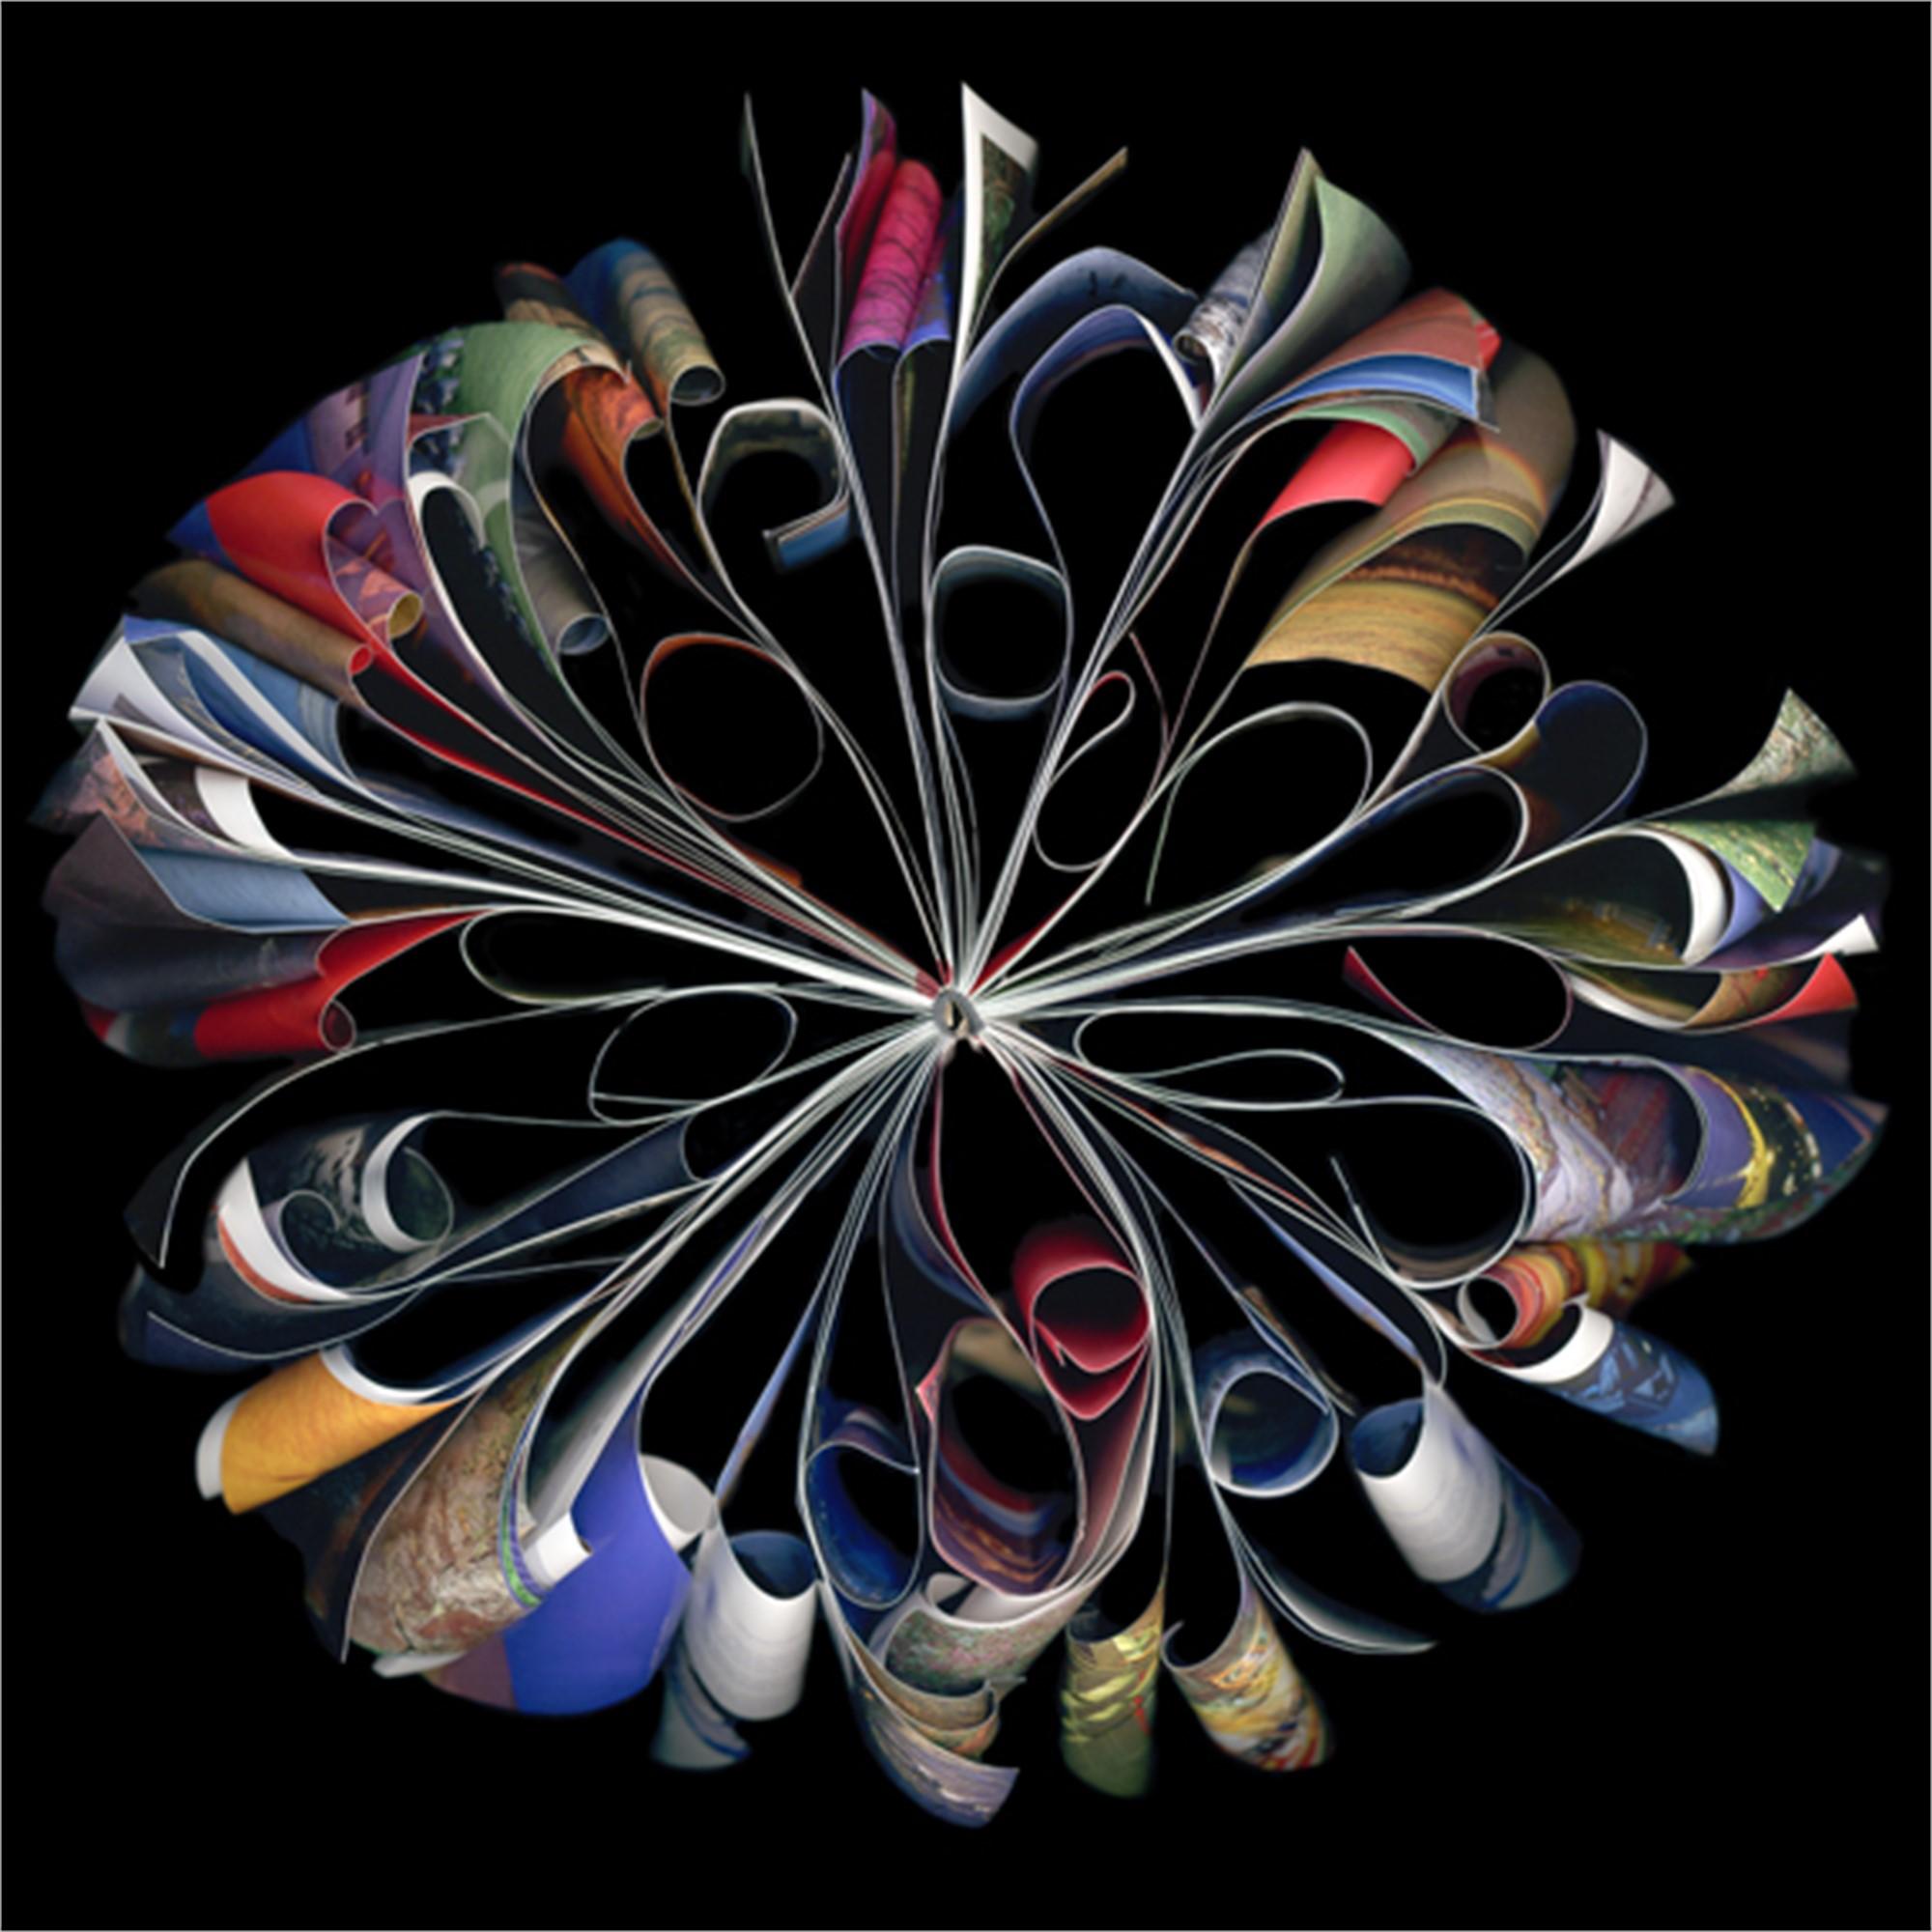 Carousel by Cara Barer